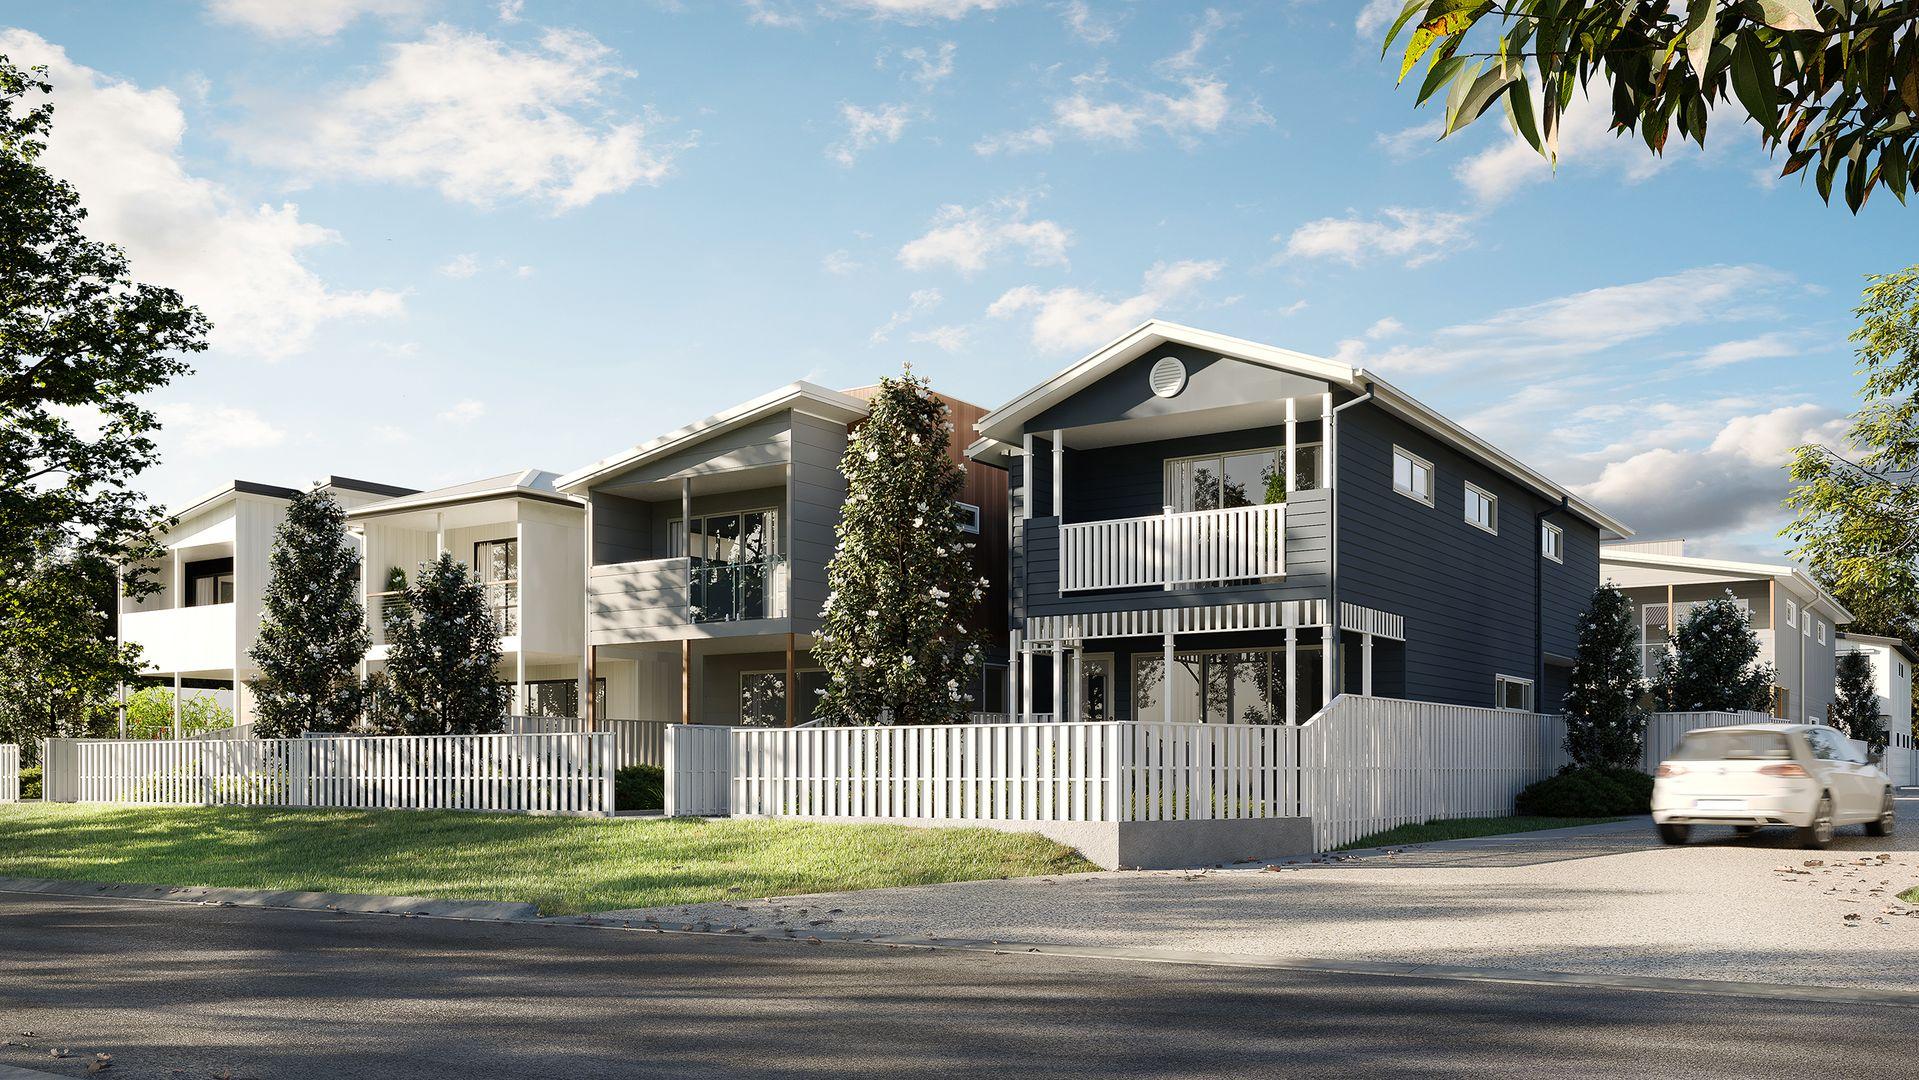 7/35 Villiers Street, Tingalpa QLD 4173, Image 0